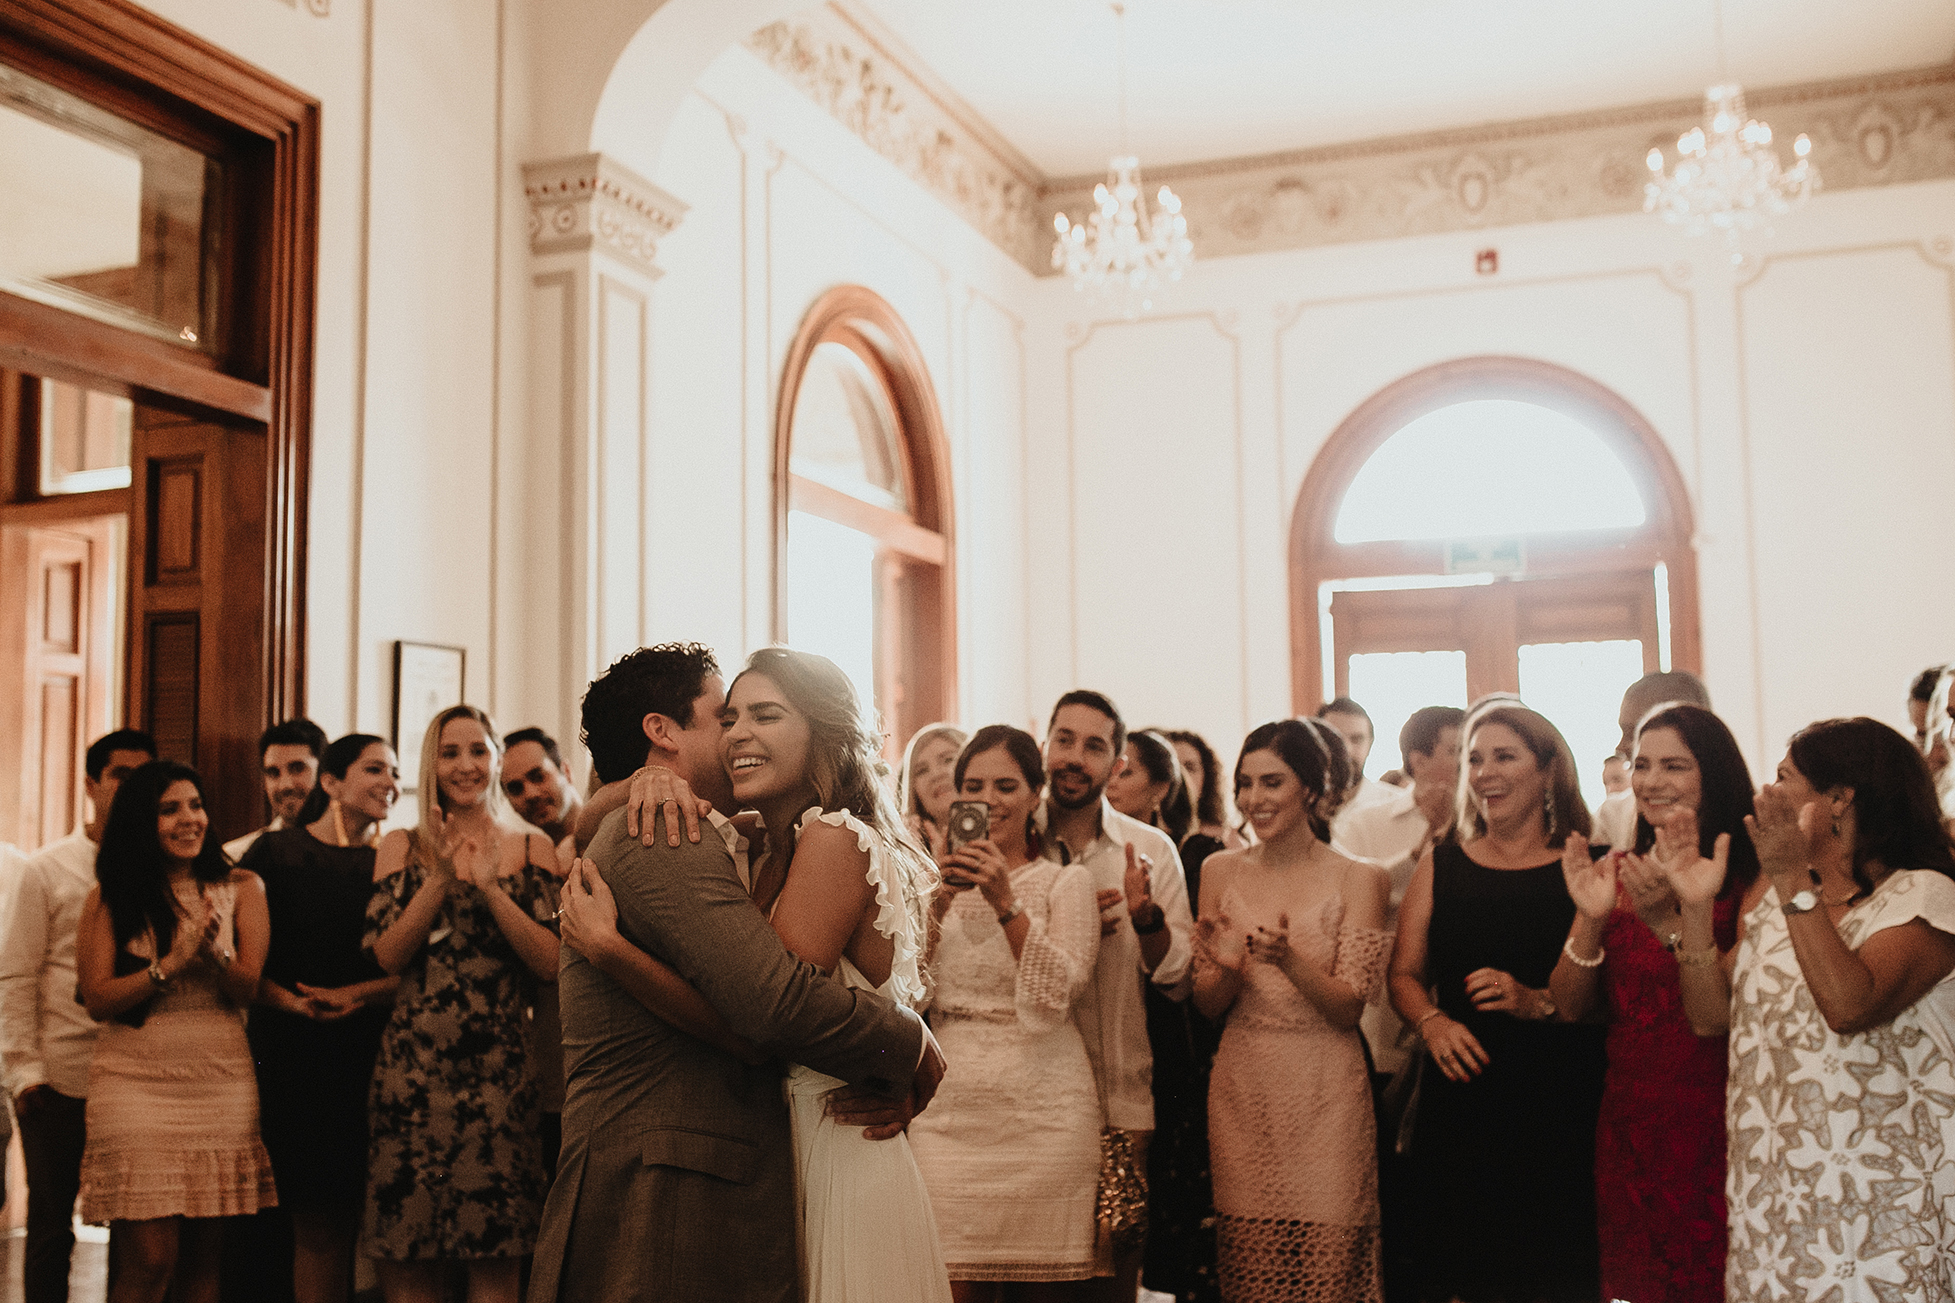 0098civil_Hacienda_WeddingDstination_MeridaYucatan_HaciendasMerida_BodasMexico_BodasYucatan_Boda_Destino.jpg